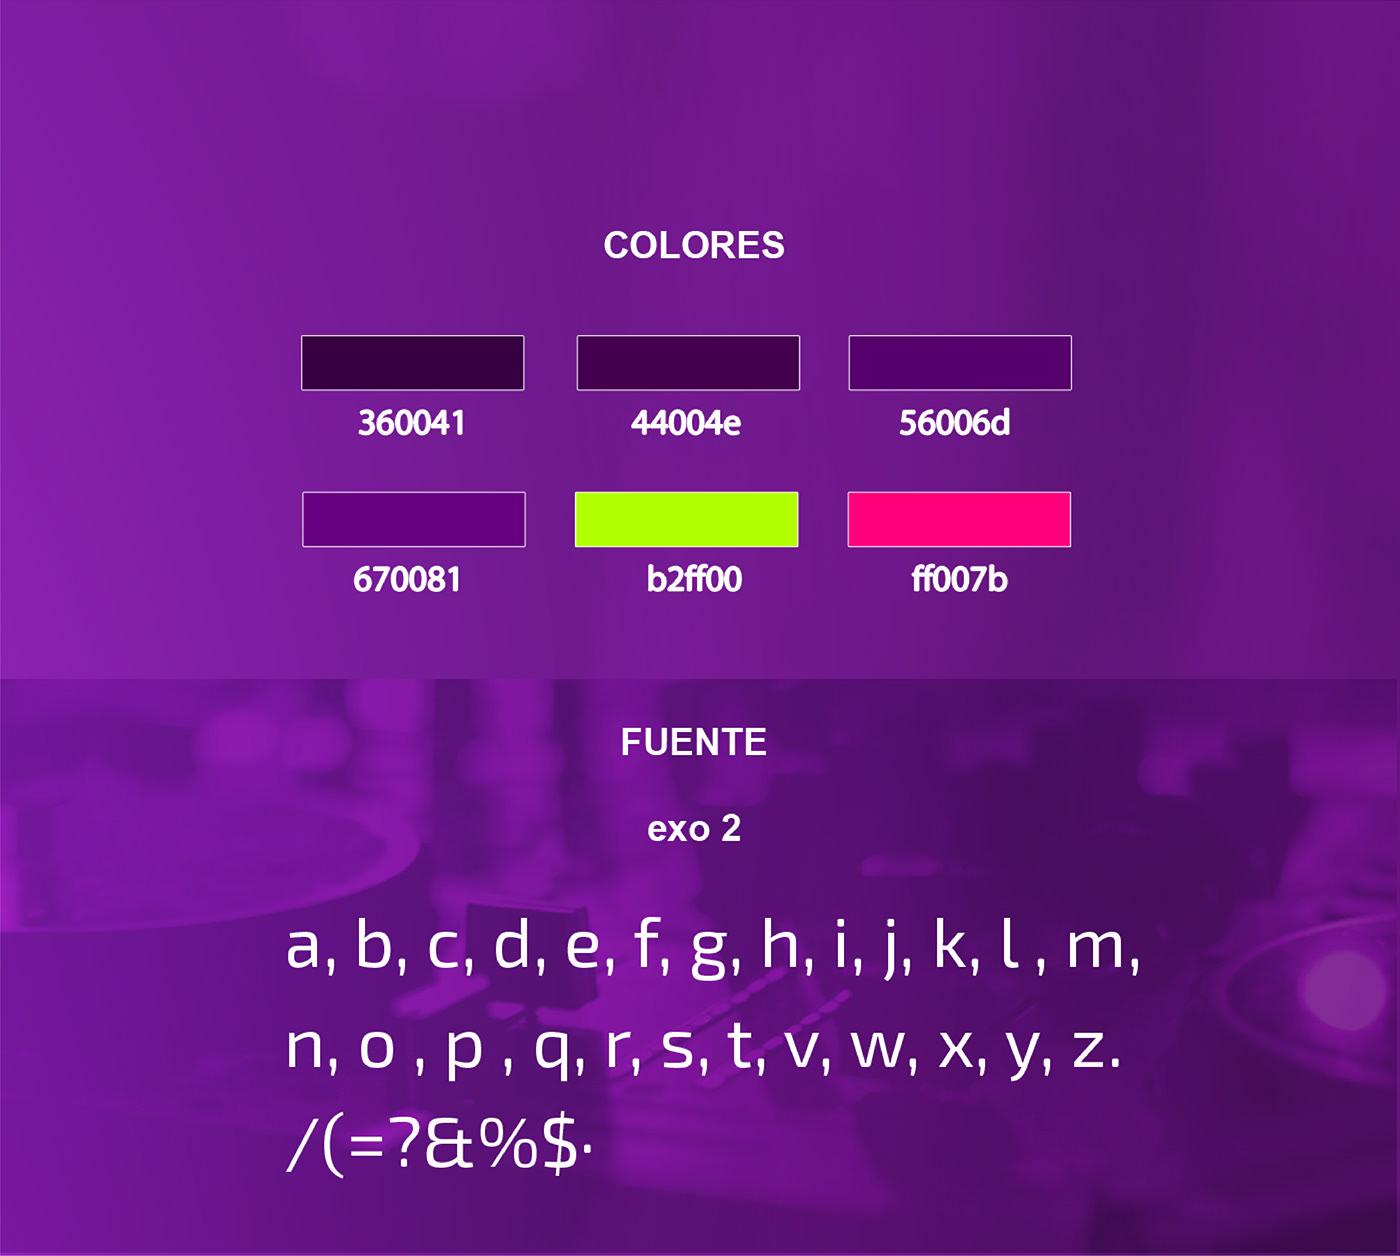 Image may contain: screenshot and violet